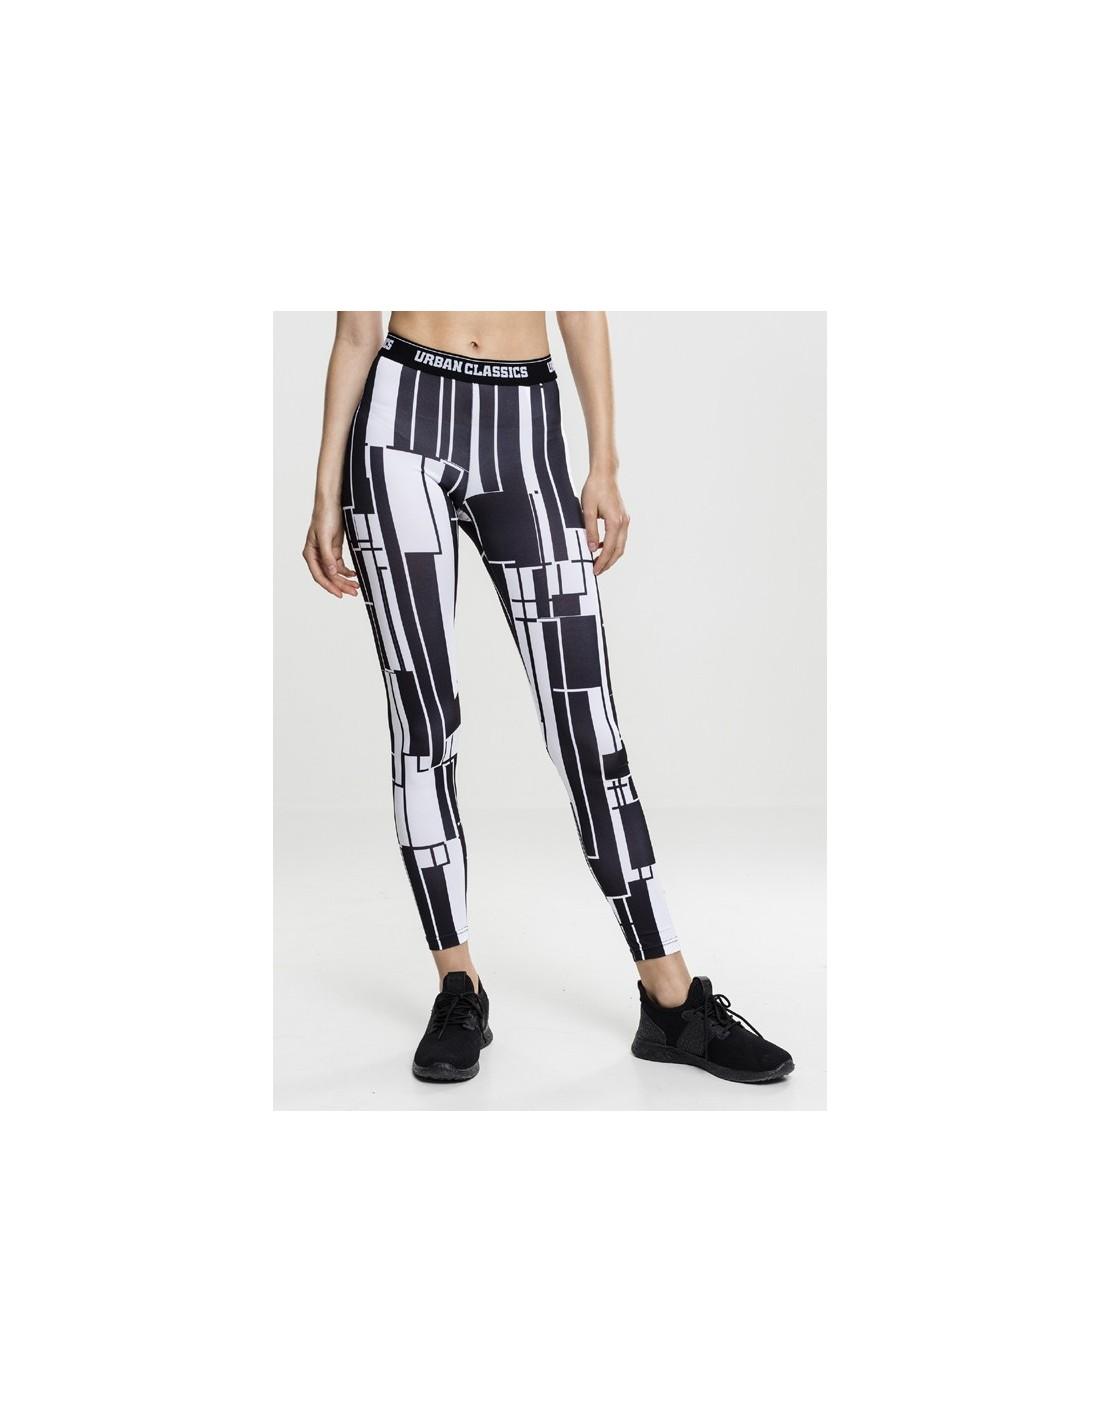 urban classics leggings sportwear black white. Black Bedroom Furniture Sets. Home Design Ideas